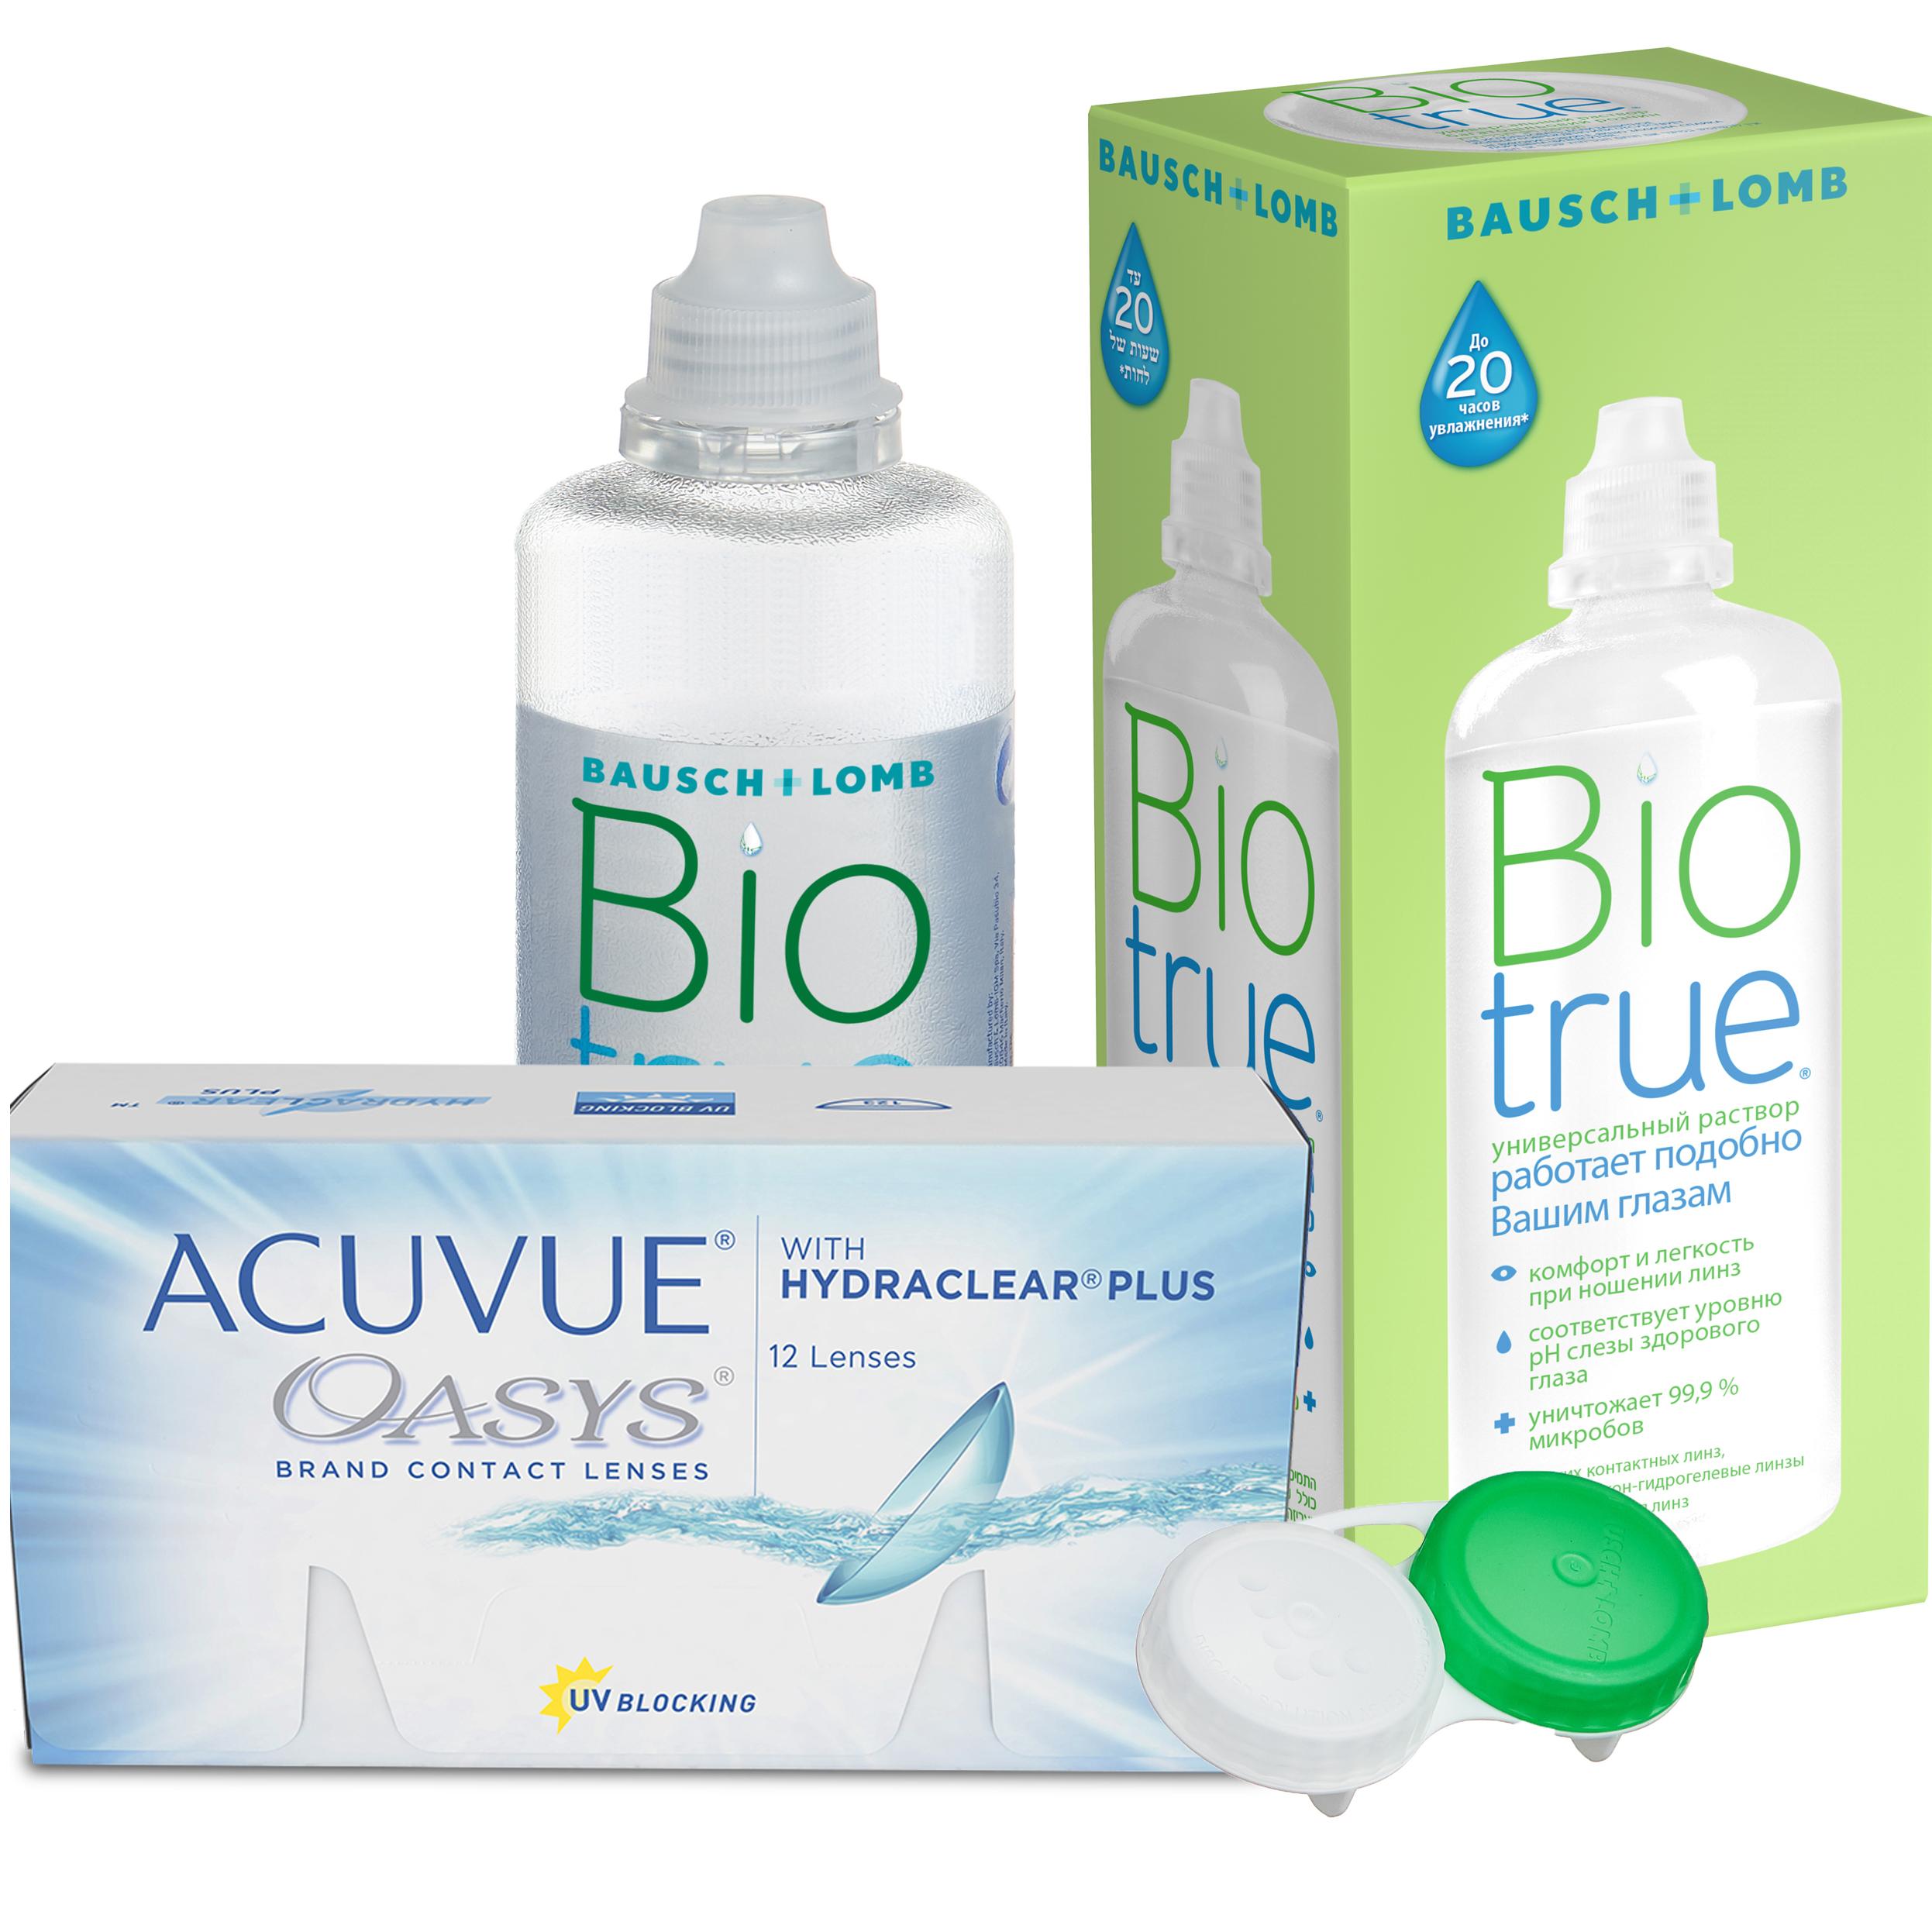 Купить Oasys with Hydraclear Plus 12 линз + Biotrue, Контактные линзы Acuvue Oasys with Hydraclear Plus 12 линз R 8.8 -0, 25 + Biotrue 300 мл